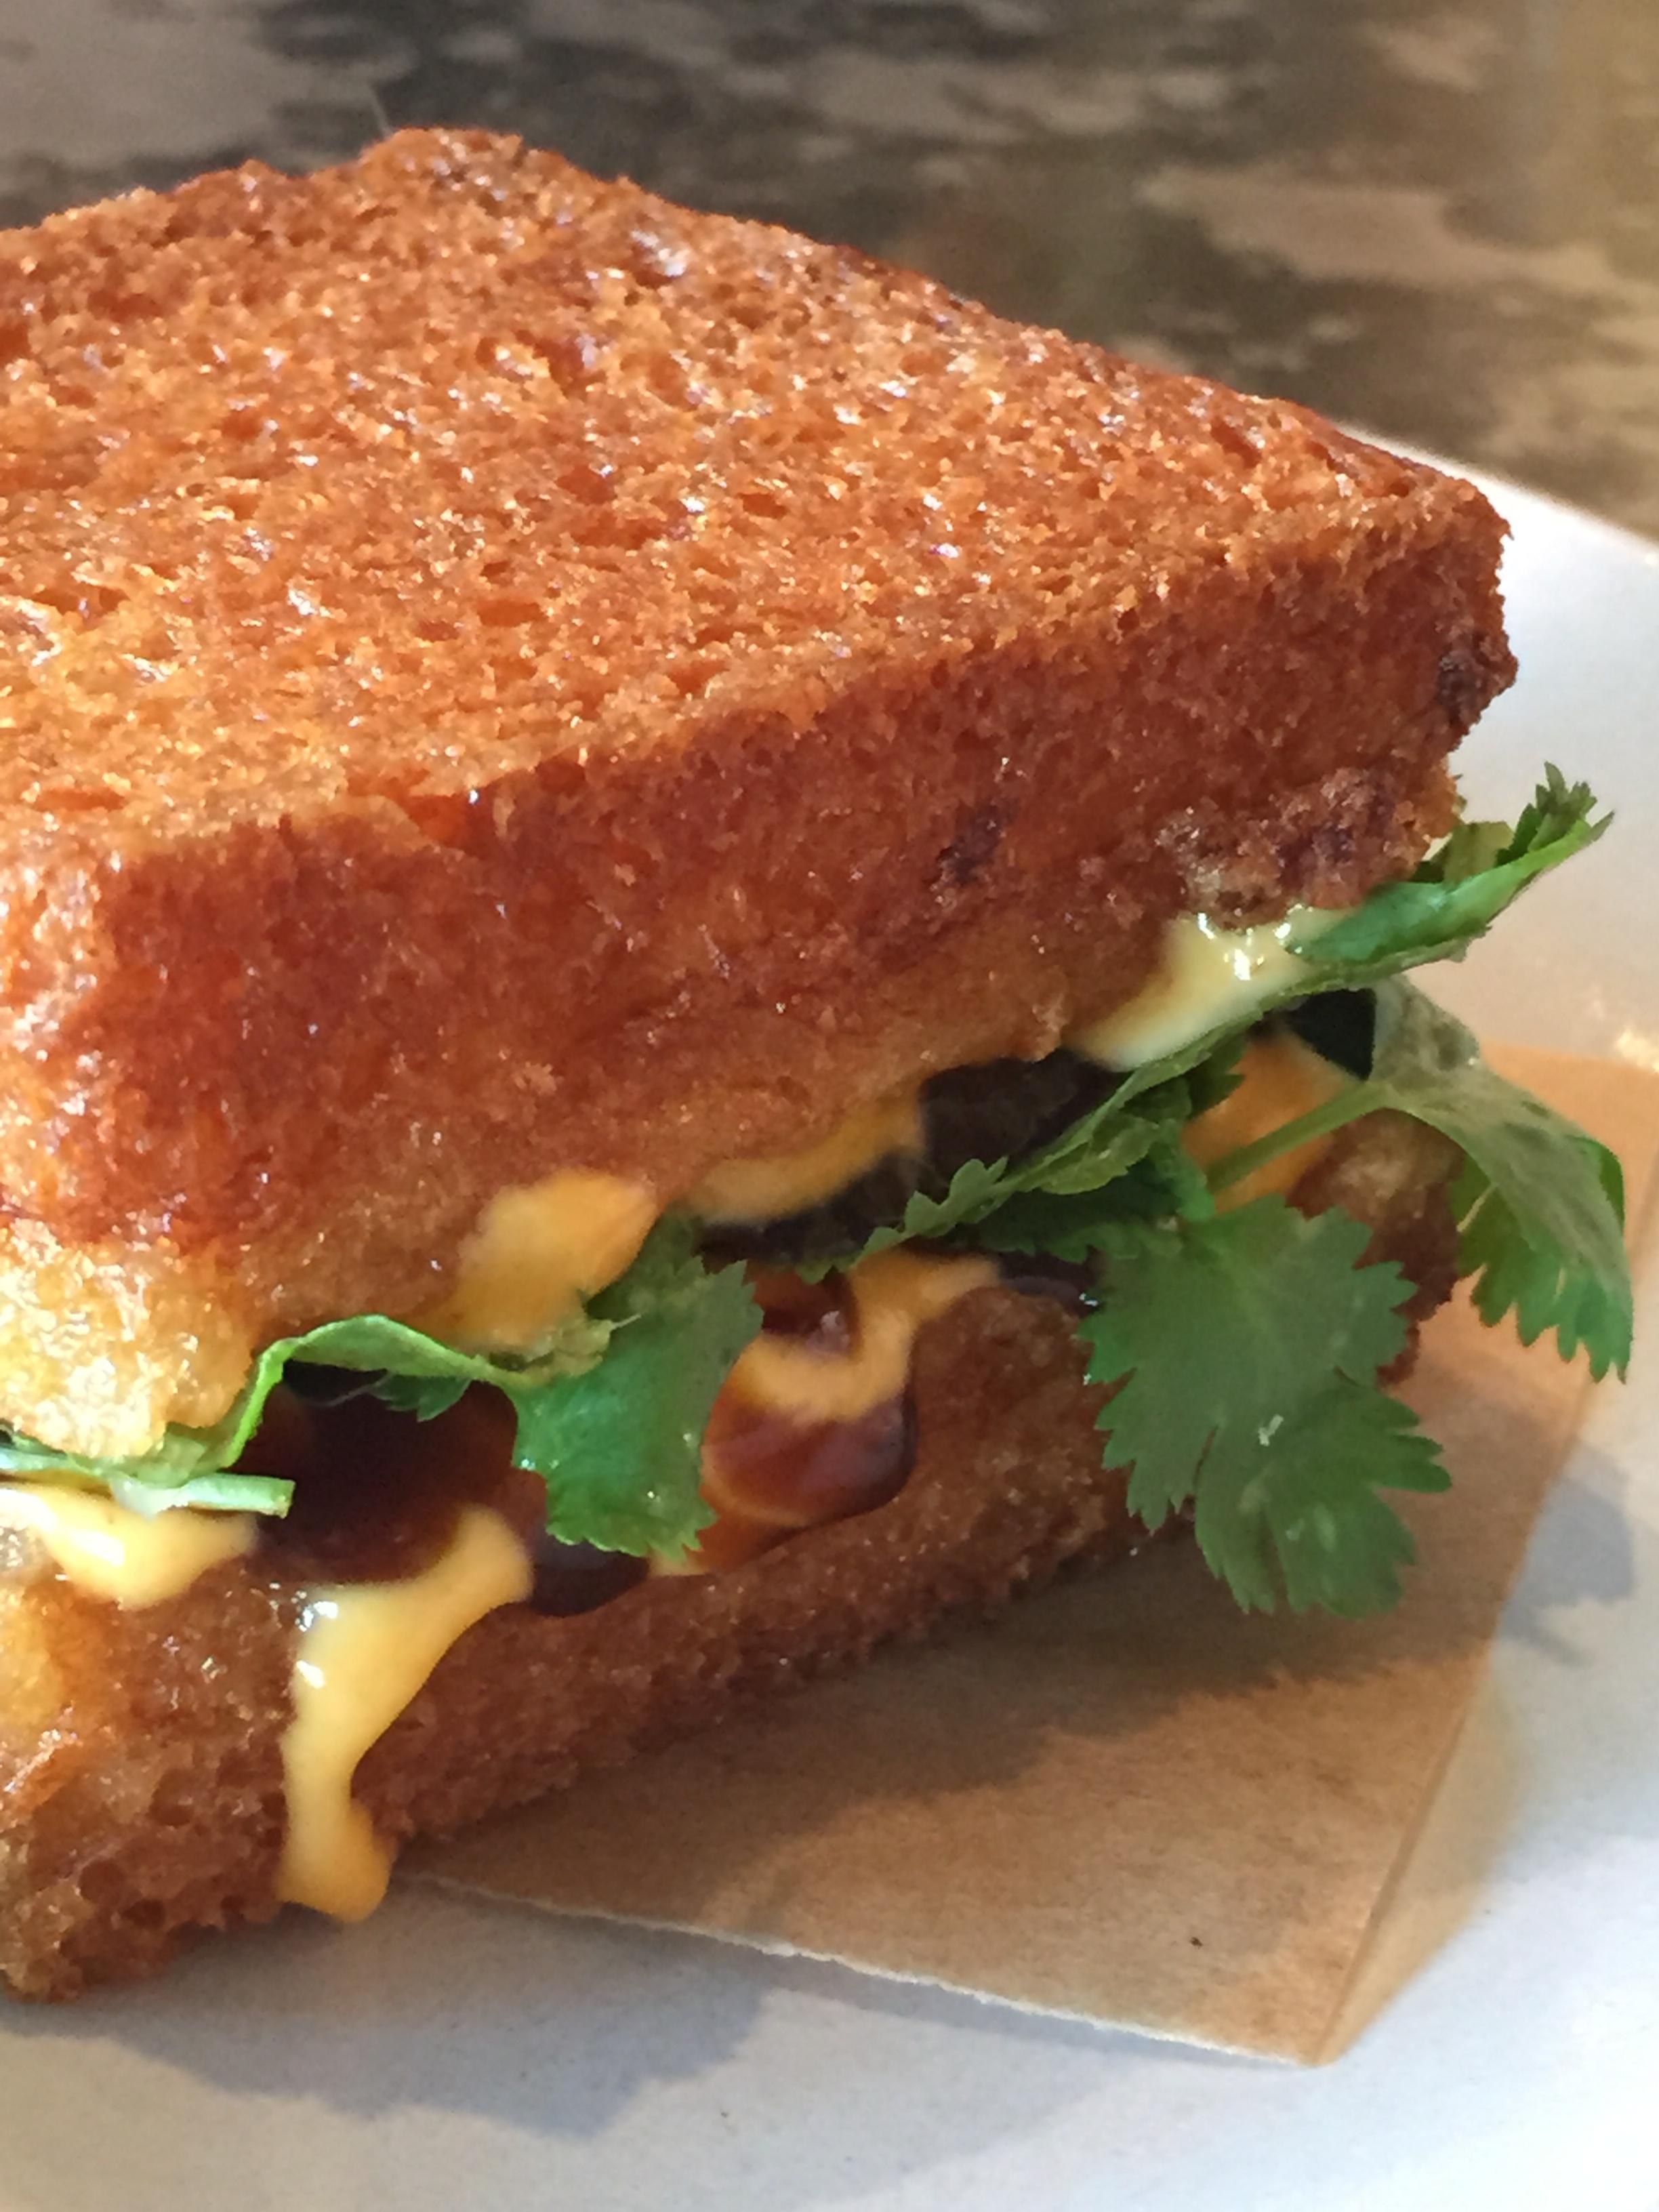 Shrimp Toast Sandwich with Herbs and Sriracha Mayo.